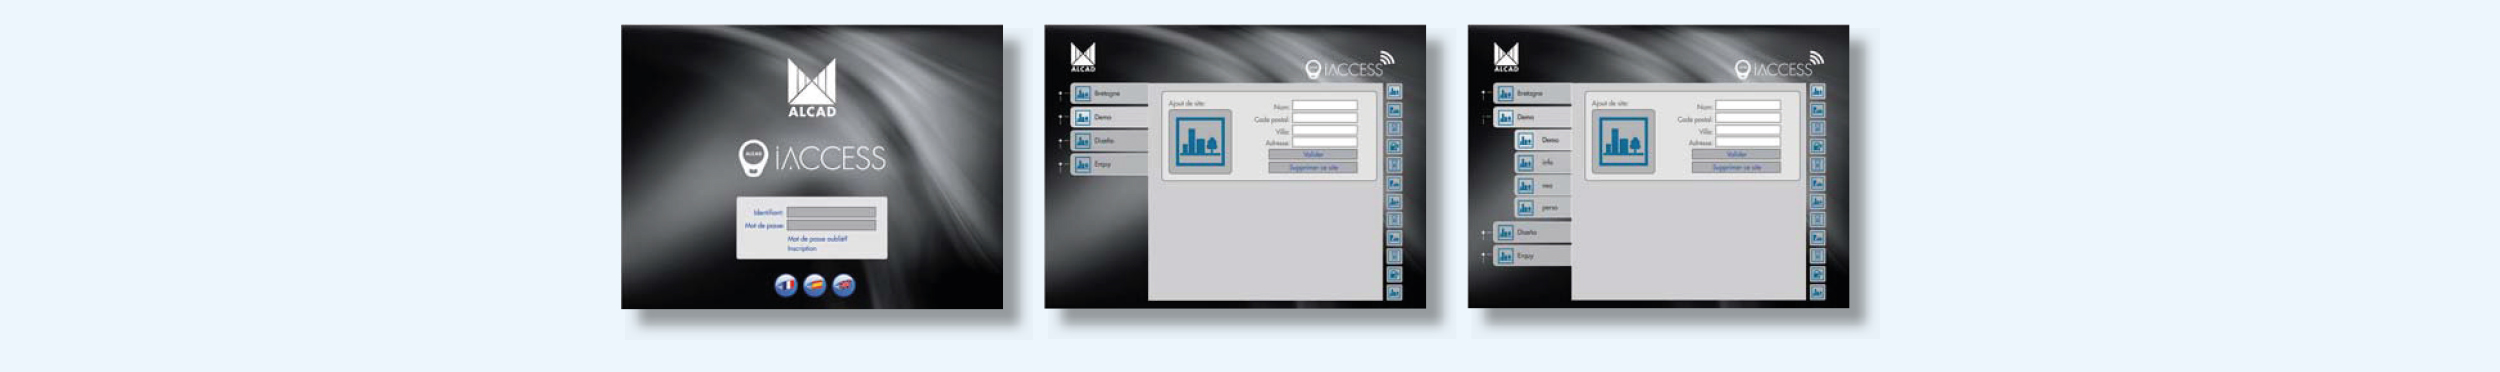 Door Access Control Wiring Diagram Moreover Door Access Control Wiring